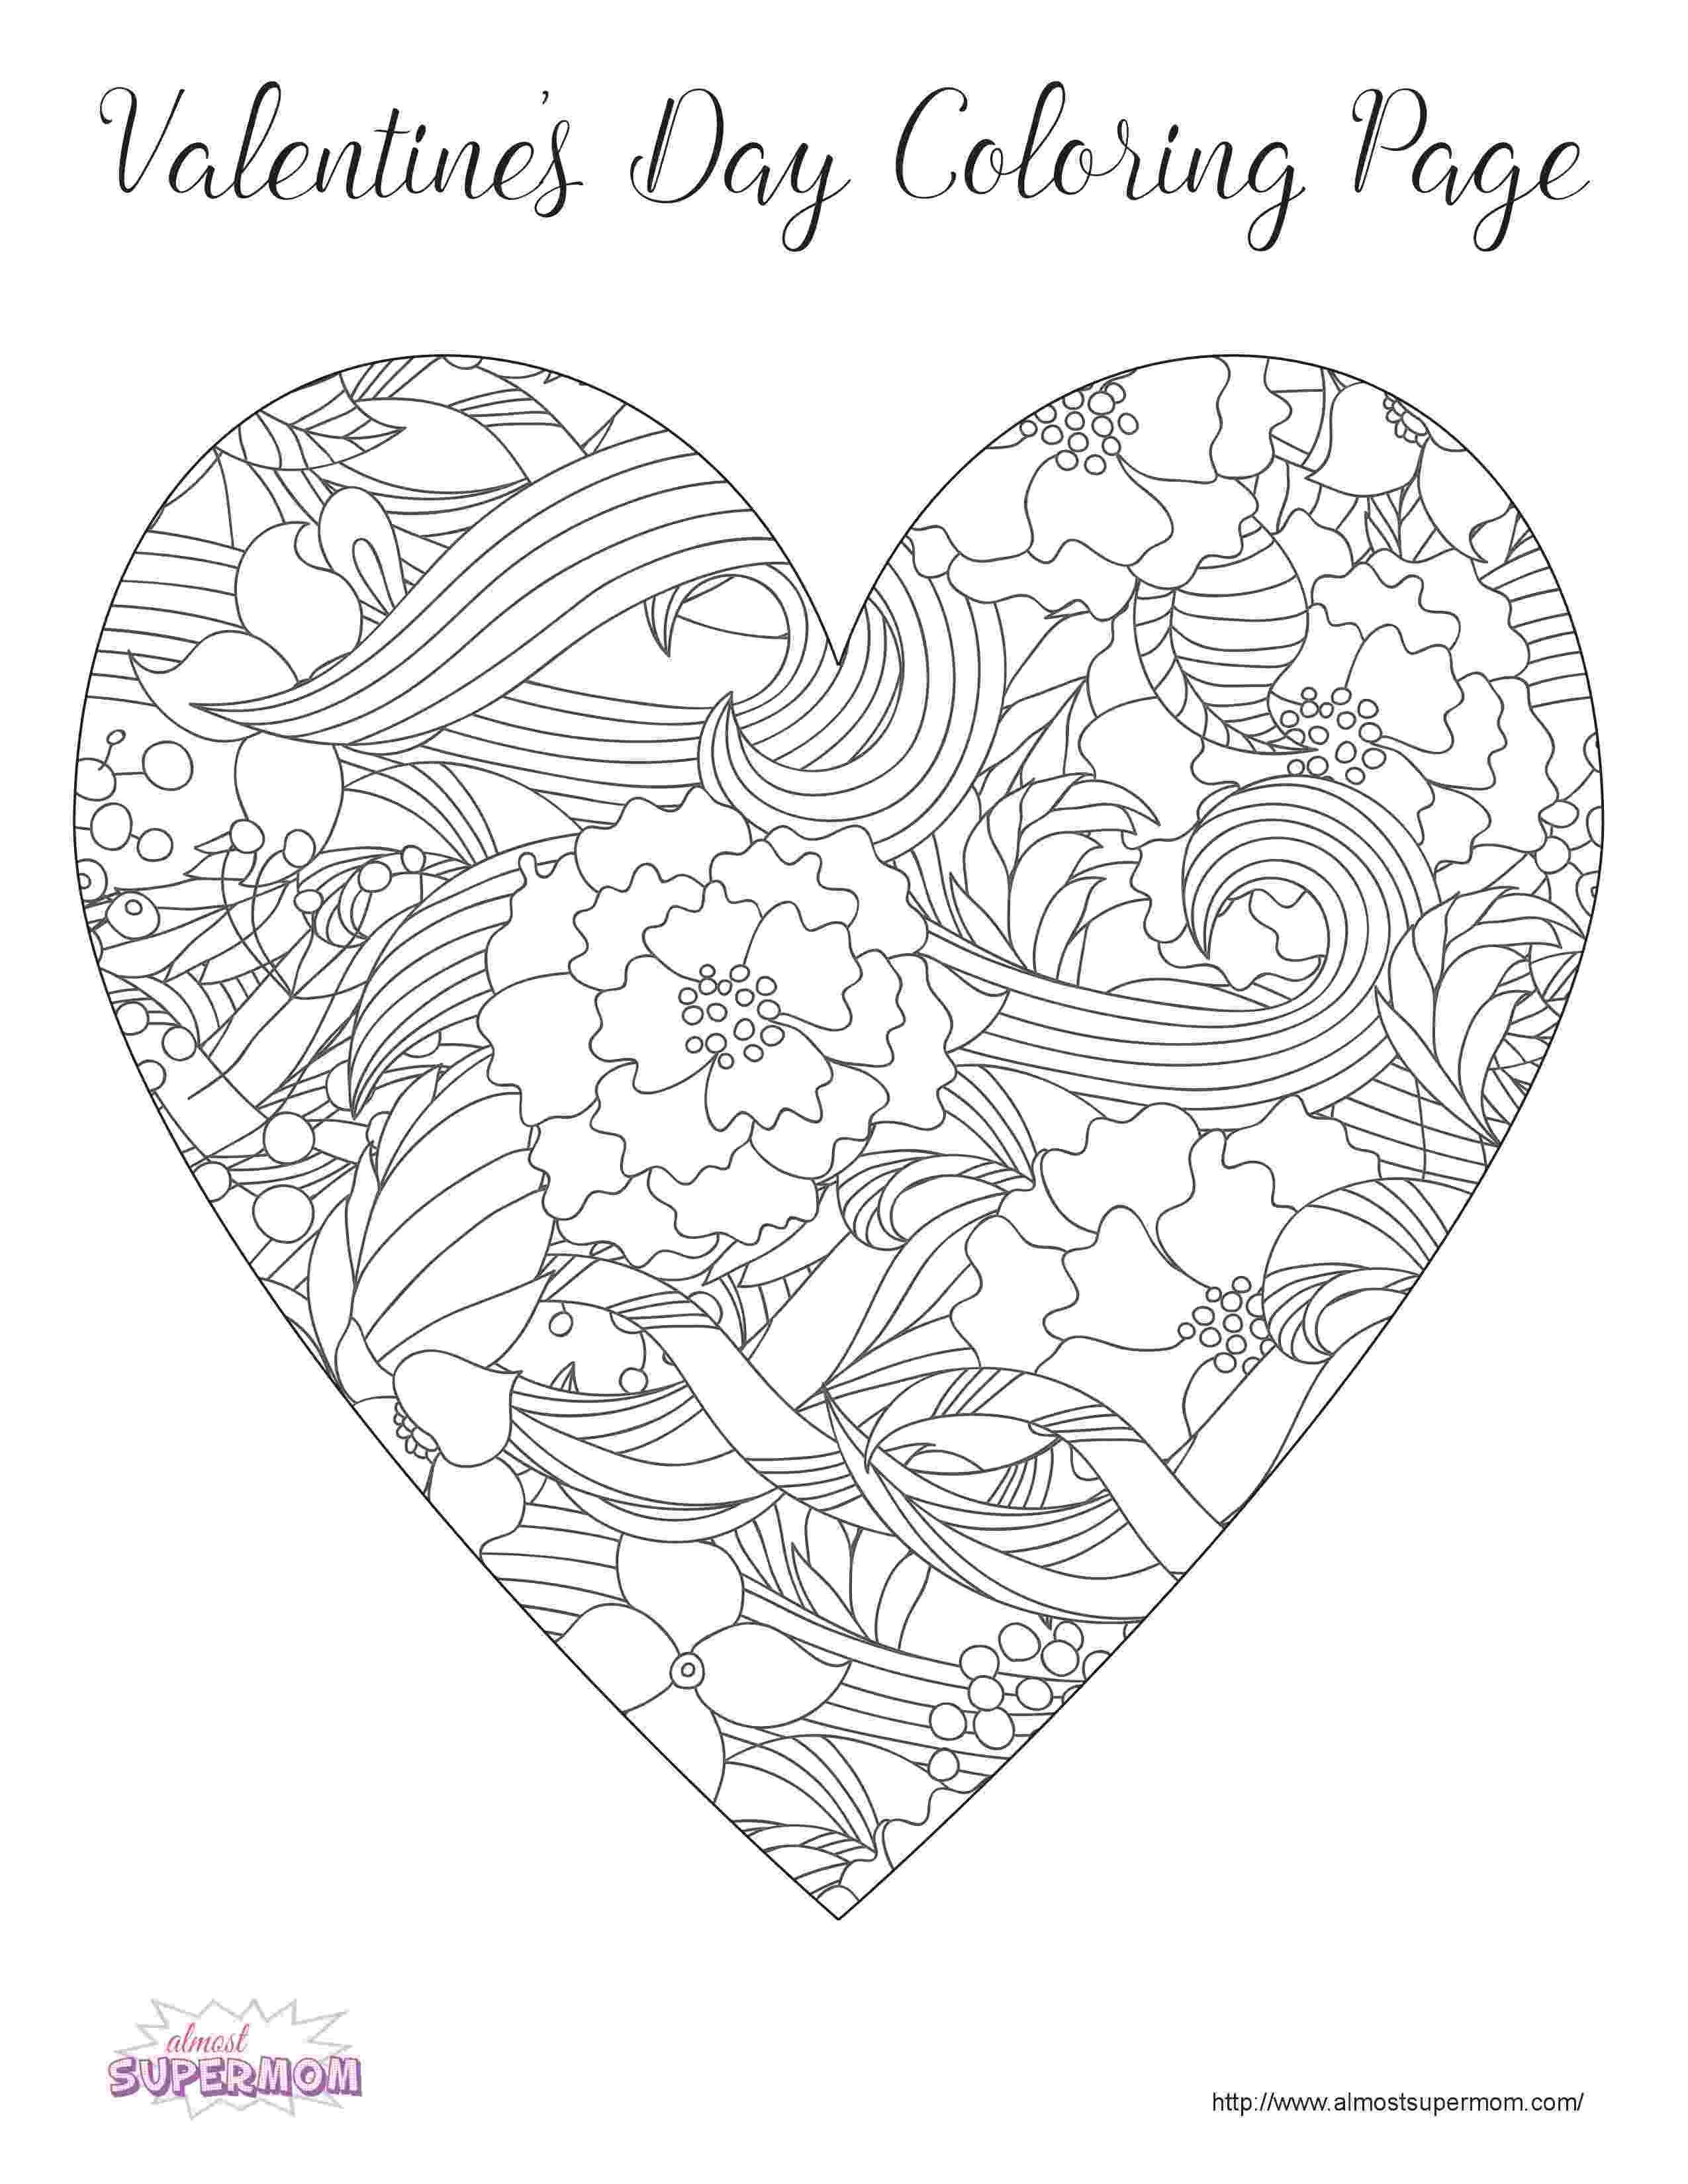 valentines day color pages colormecrazyorg valentine coloring pages color pages day valentines